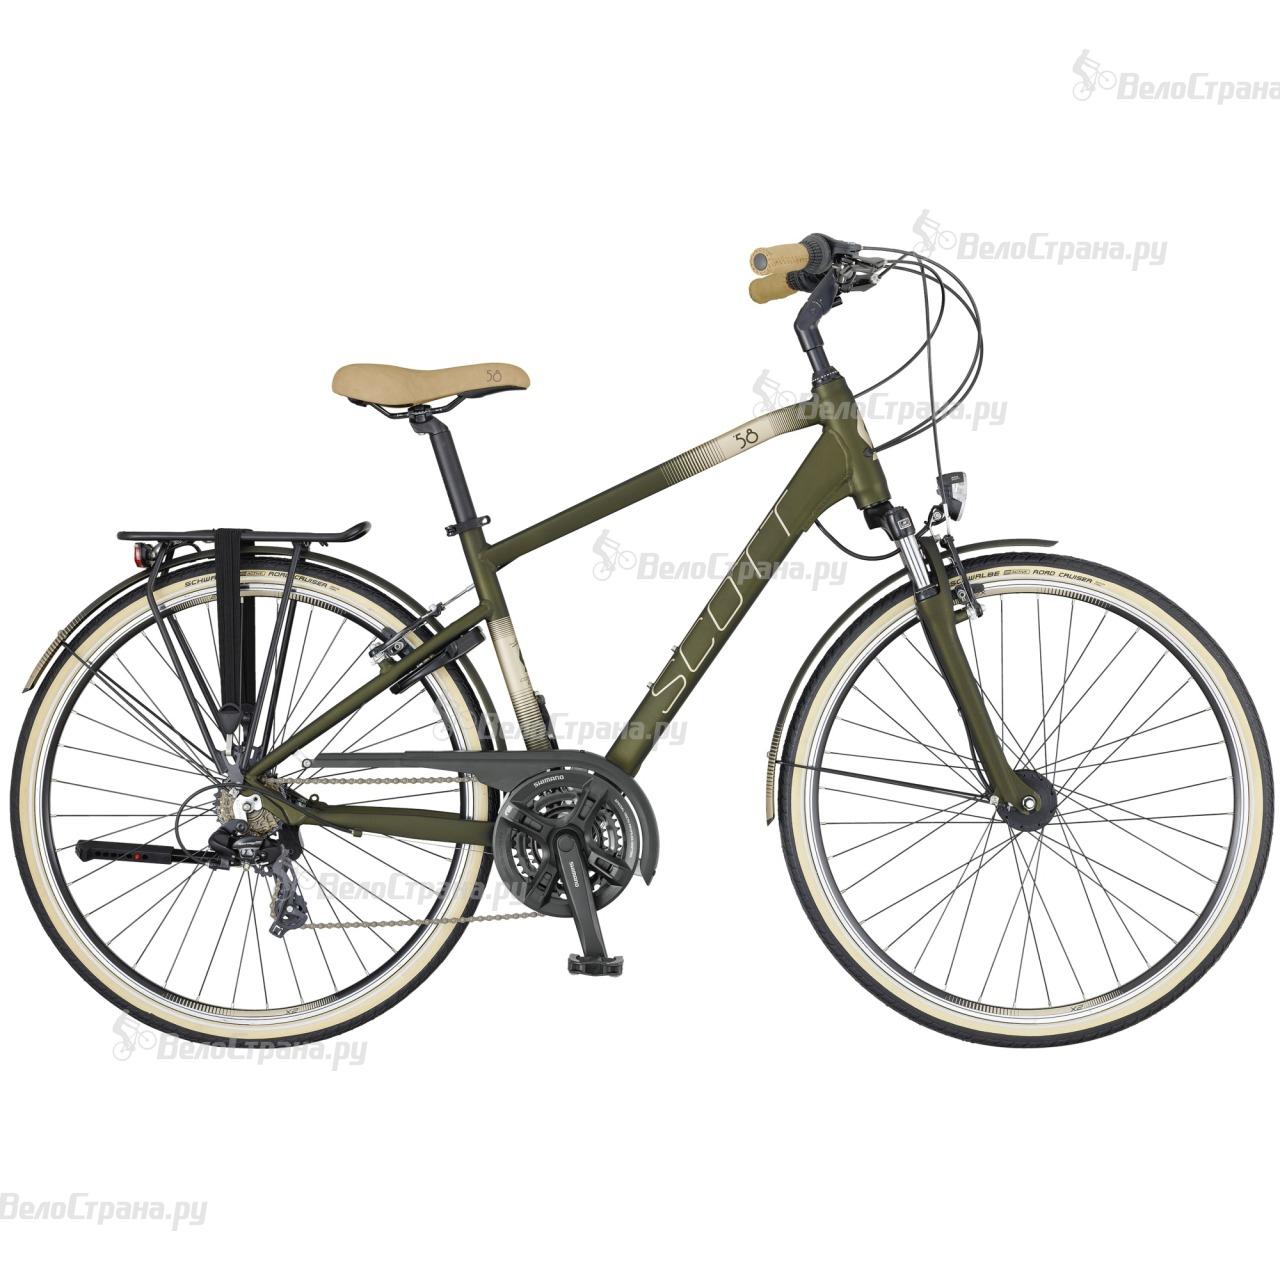 Велосипед Scott Sub Comfort 20 Men (2017) ganesh kumar t sustainable vermicomposting of salvinia molesta mitchell